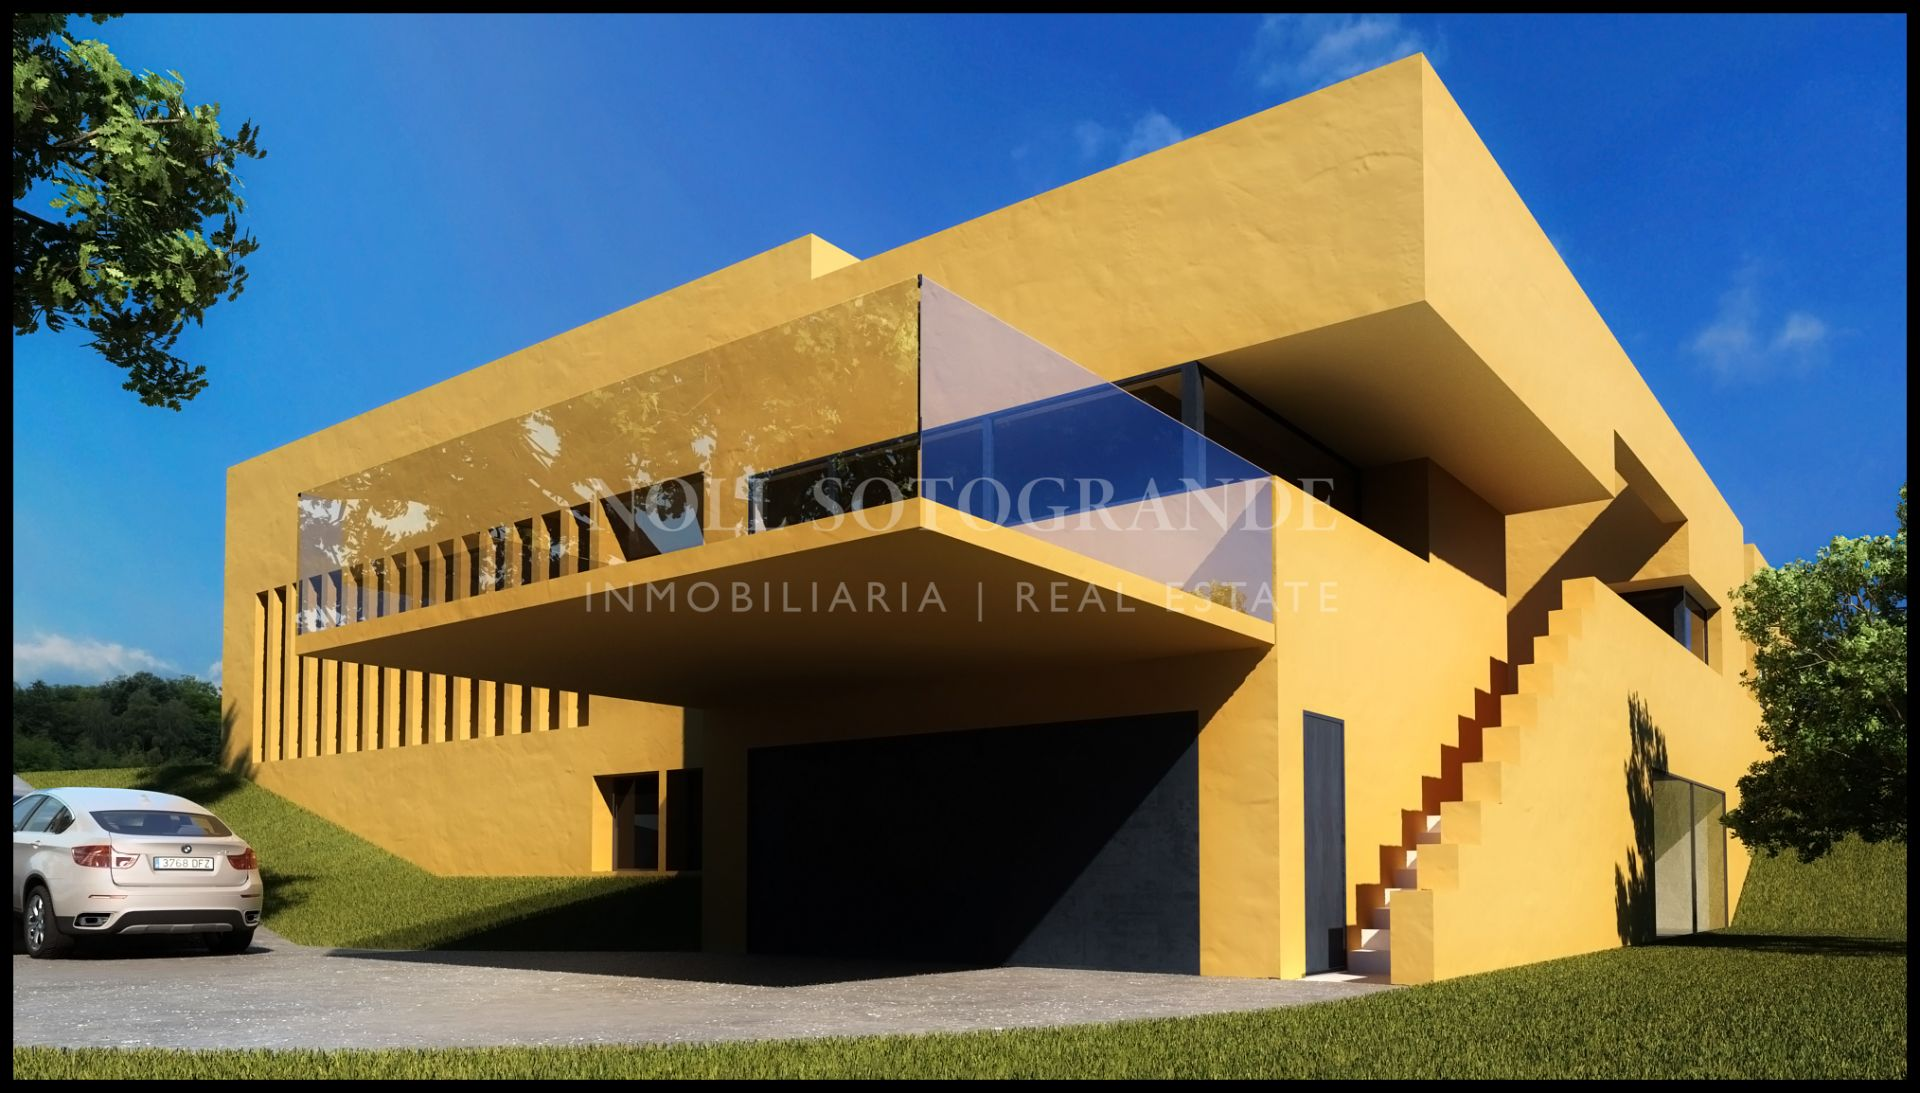 Sotogrande Villa under construction